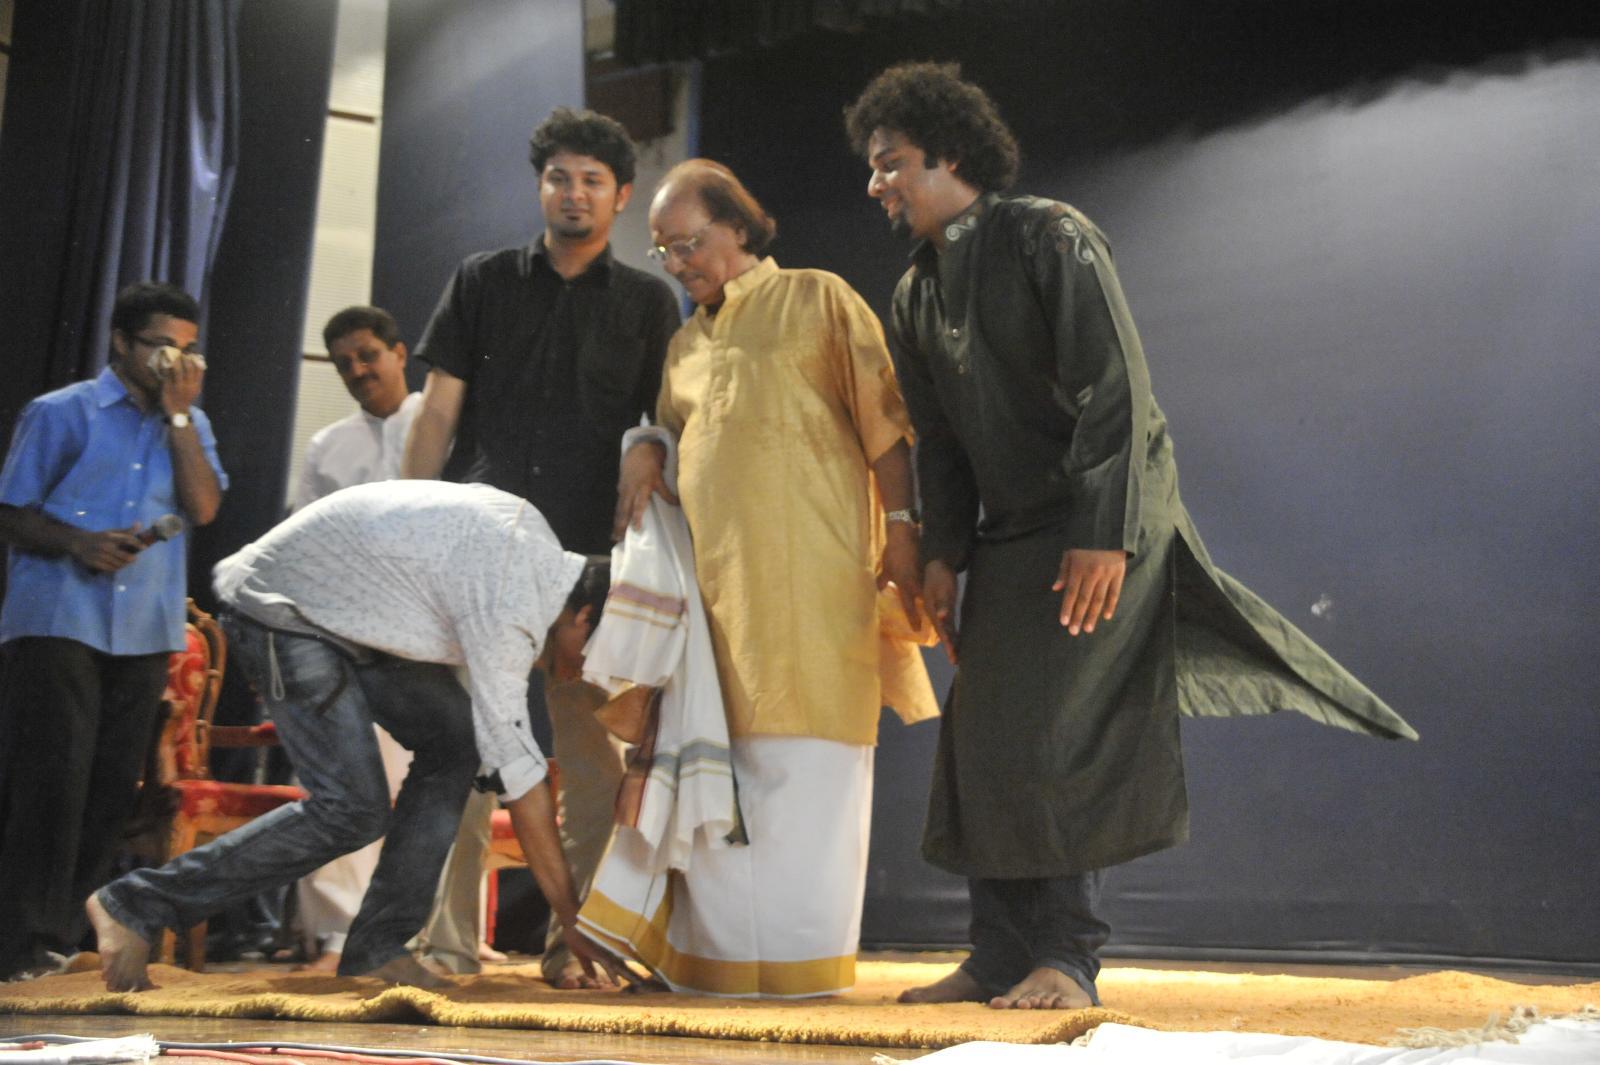 Sh T V Gopalakrishnan had too many attendees, and the three from Pakistan